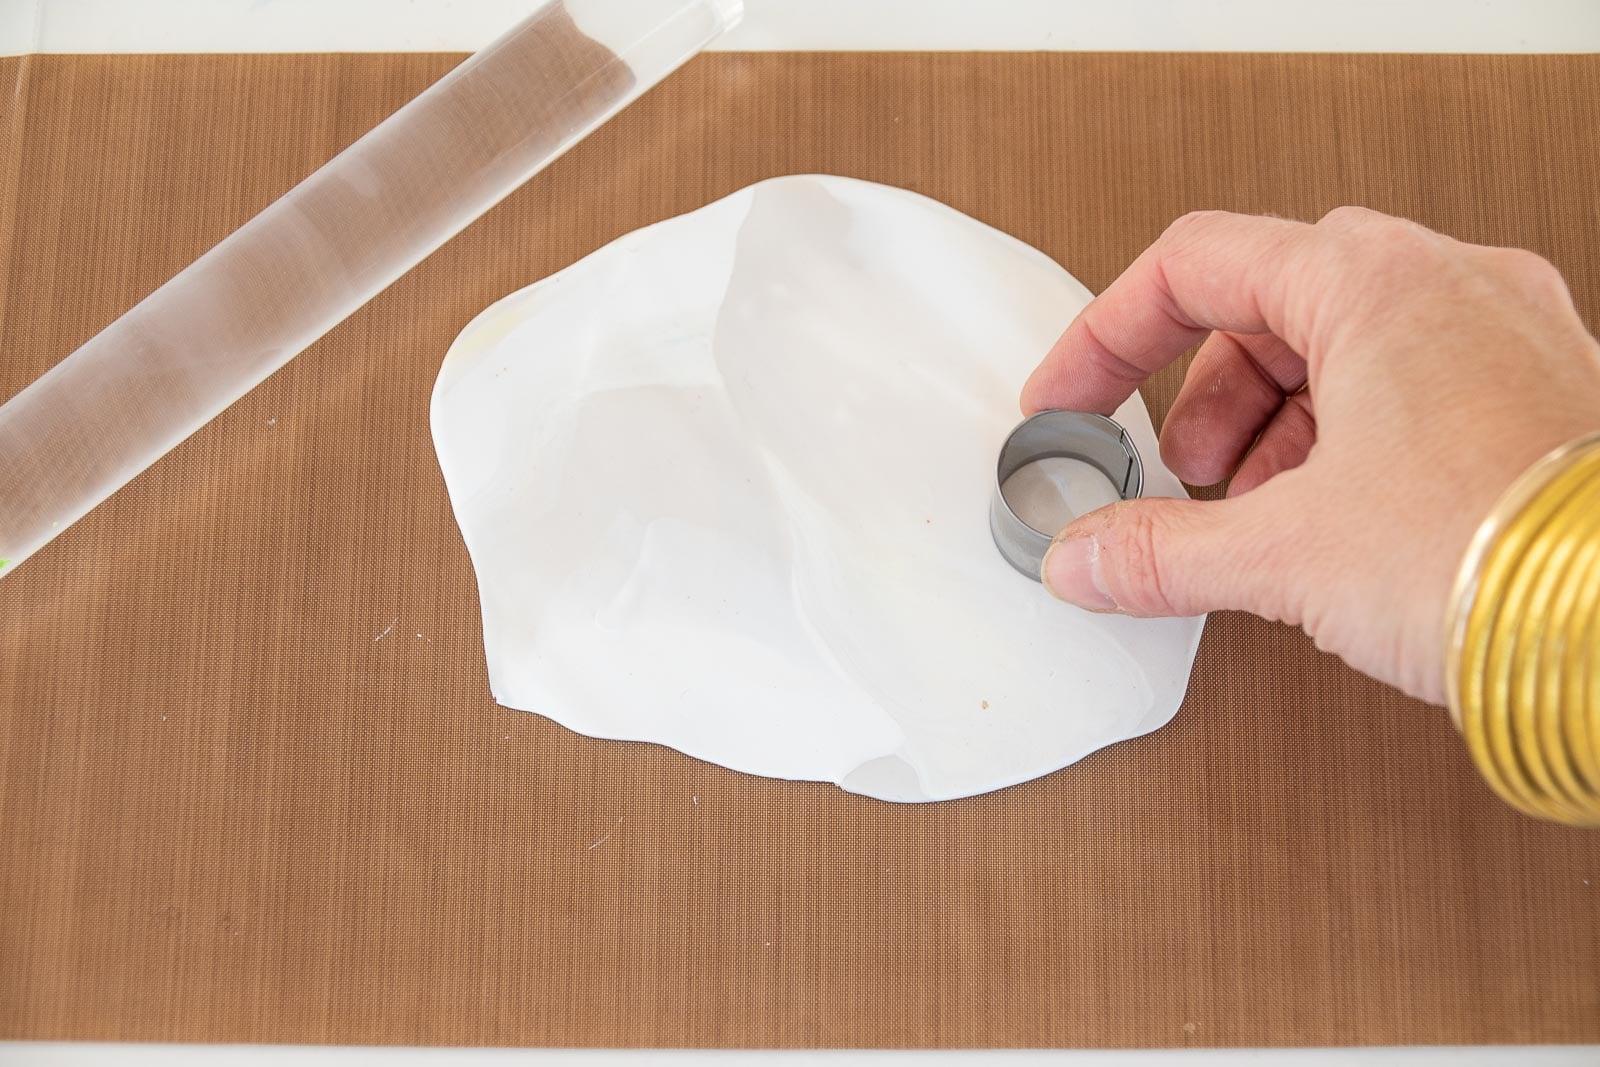 cut clay into circles